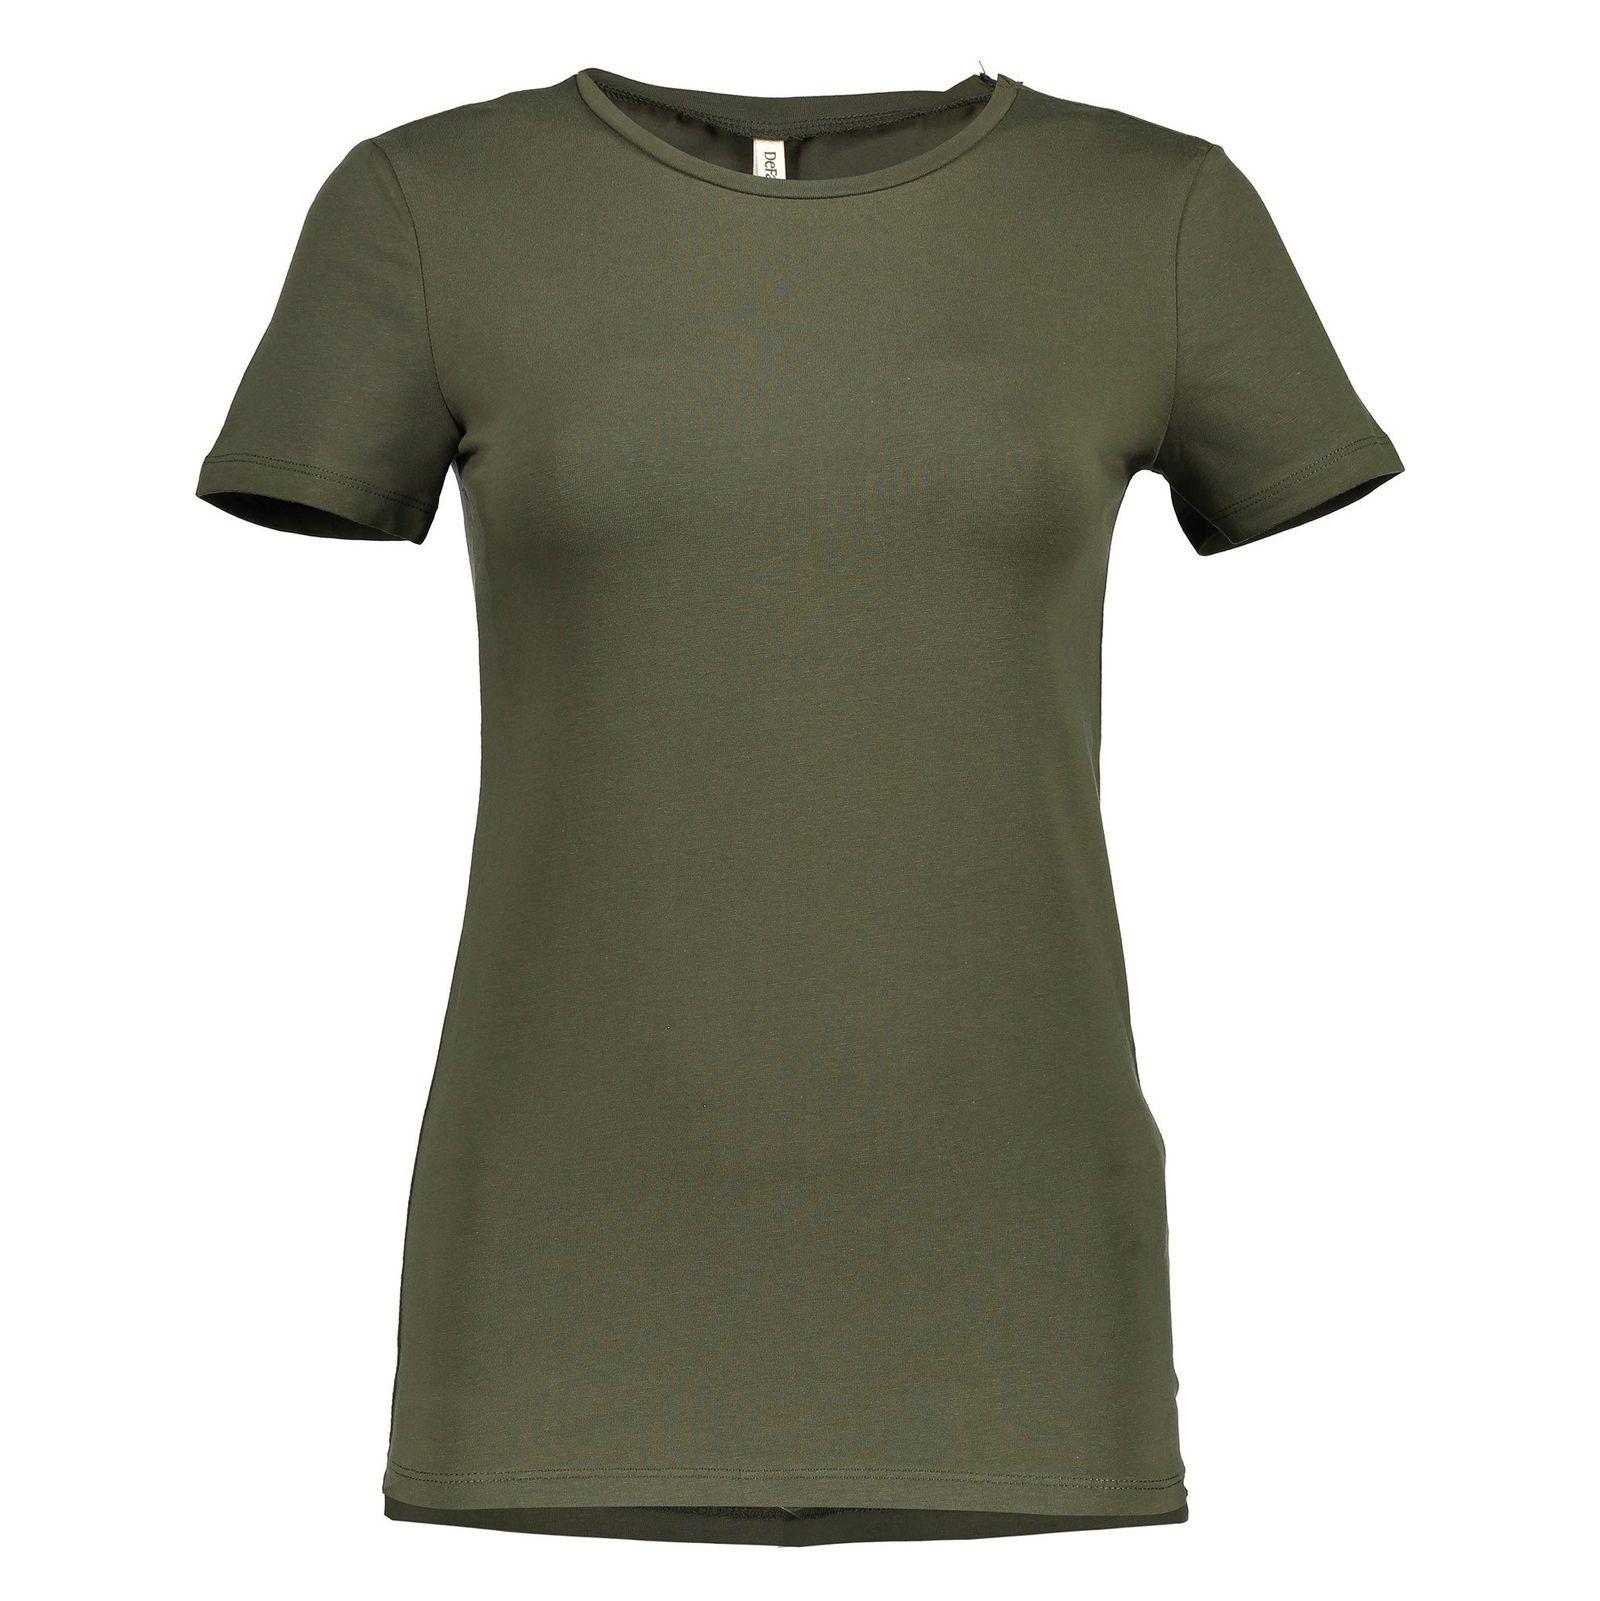 تی شرت نخی یقه گرد زنانه - دفکتو - زيتوني - 1